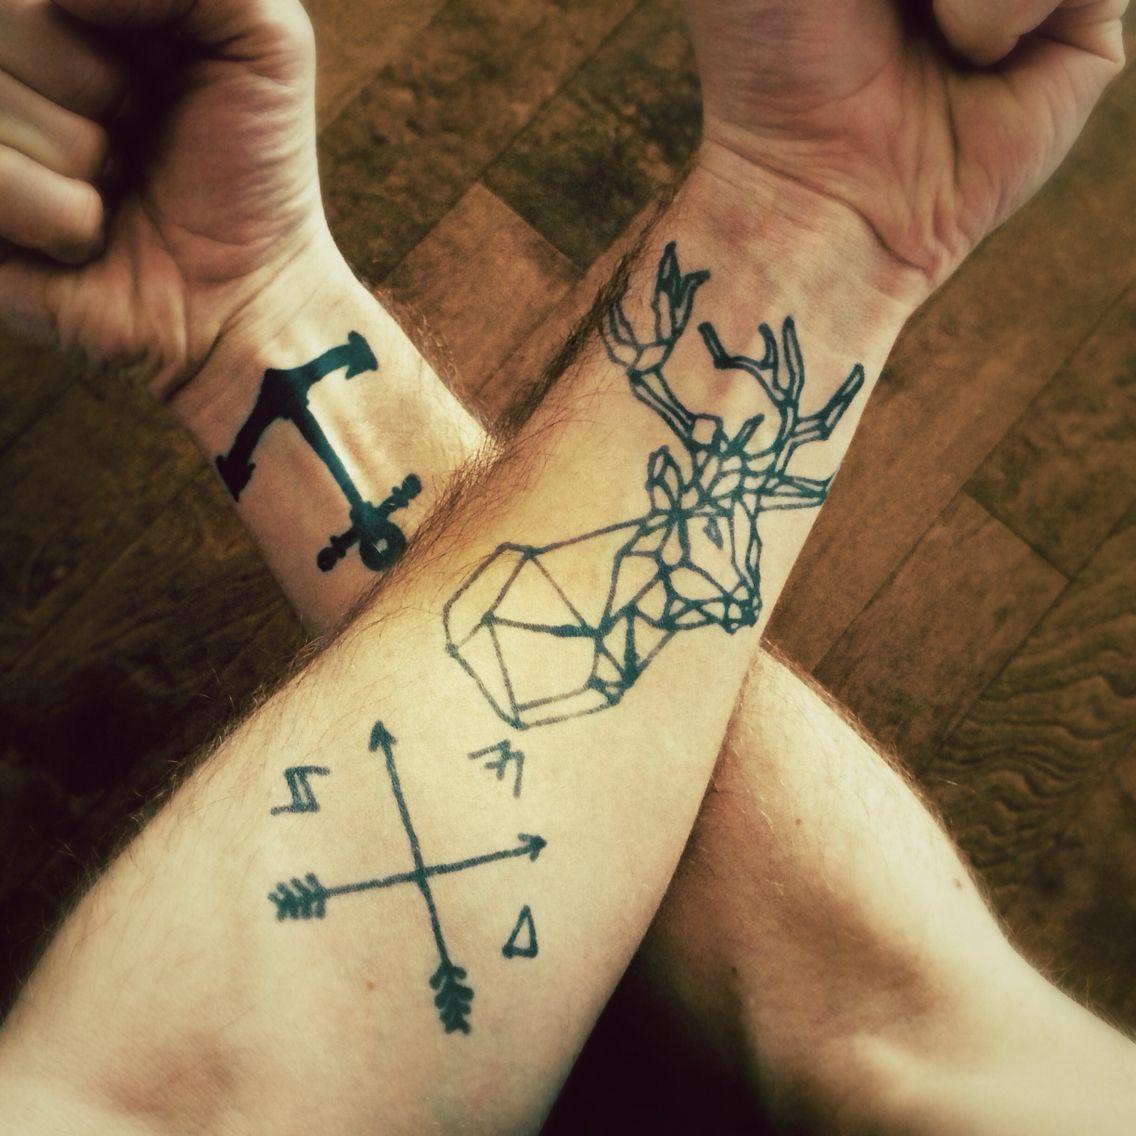 Tatouage avant bras cerf ancre tatoo pinterest tatouage avant bras avant bras et cerf - Tatouage avant bras douleur ...